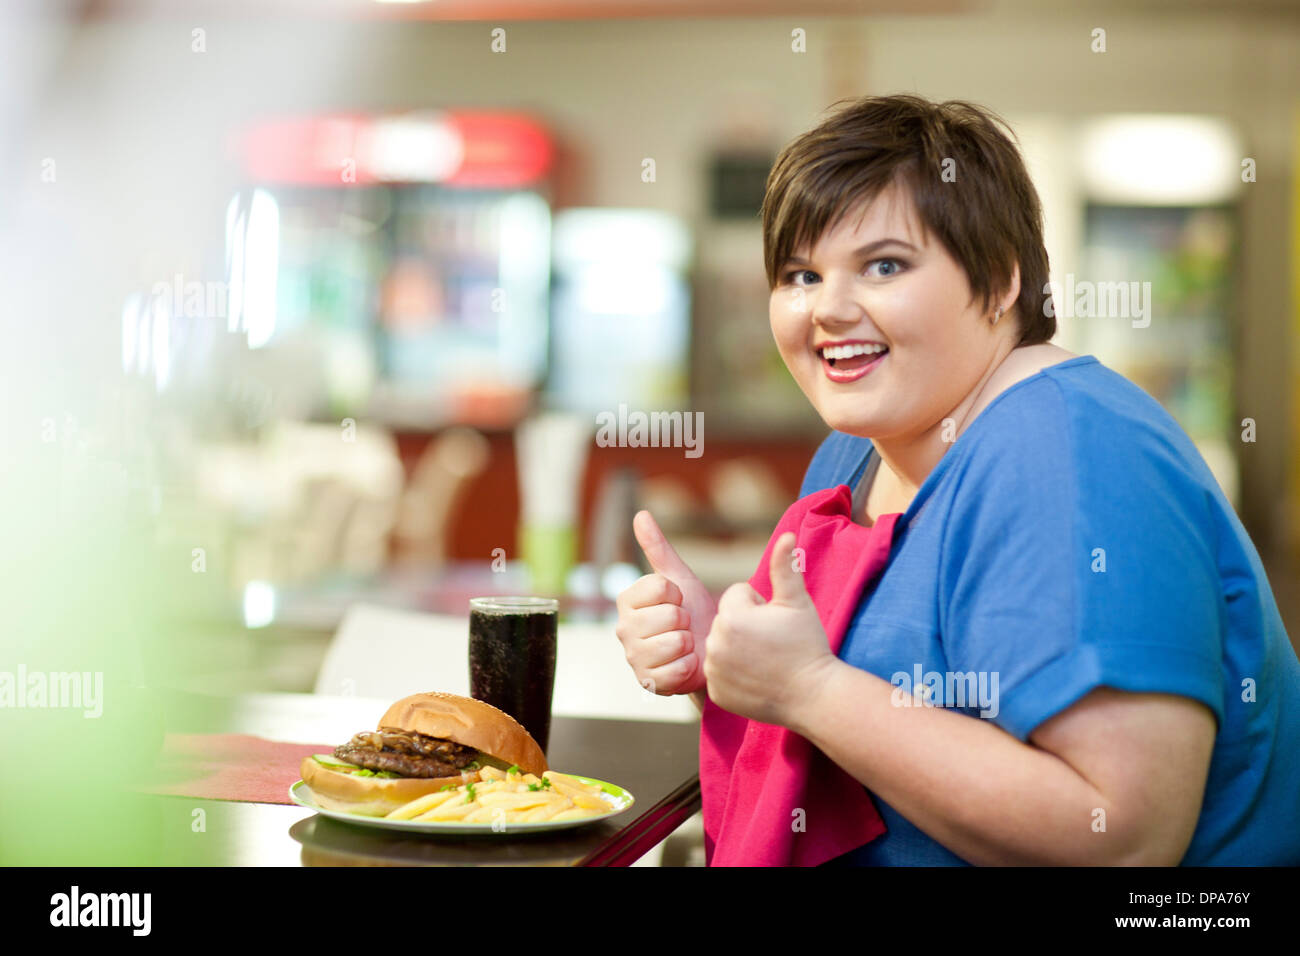 Junge Frau in Café mit ungesunde Mahlzeit Stockbild